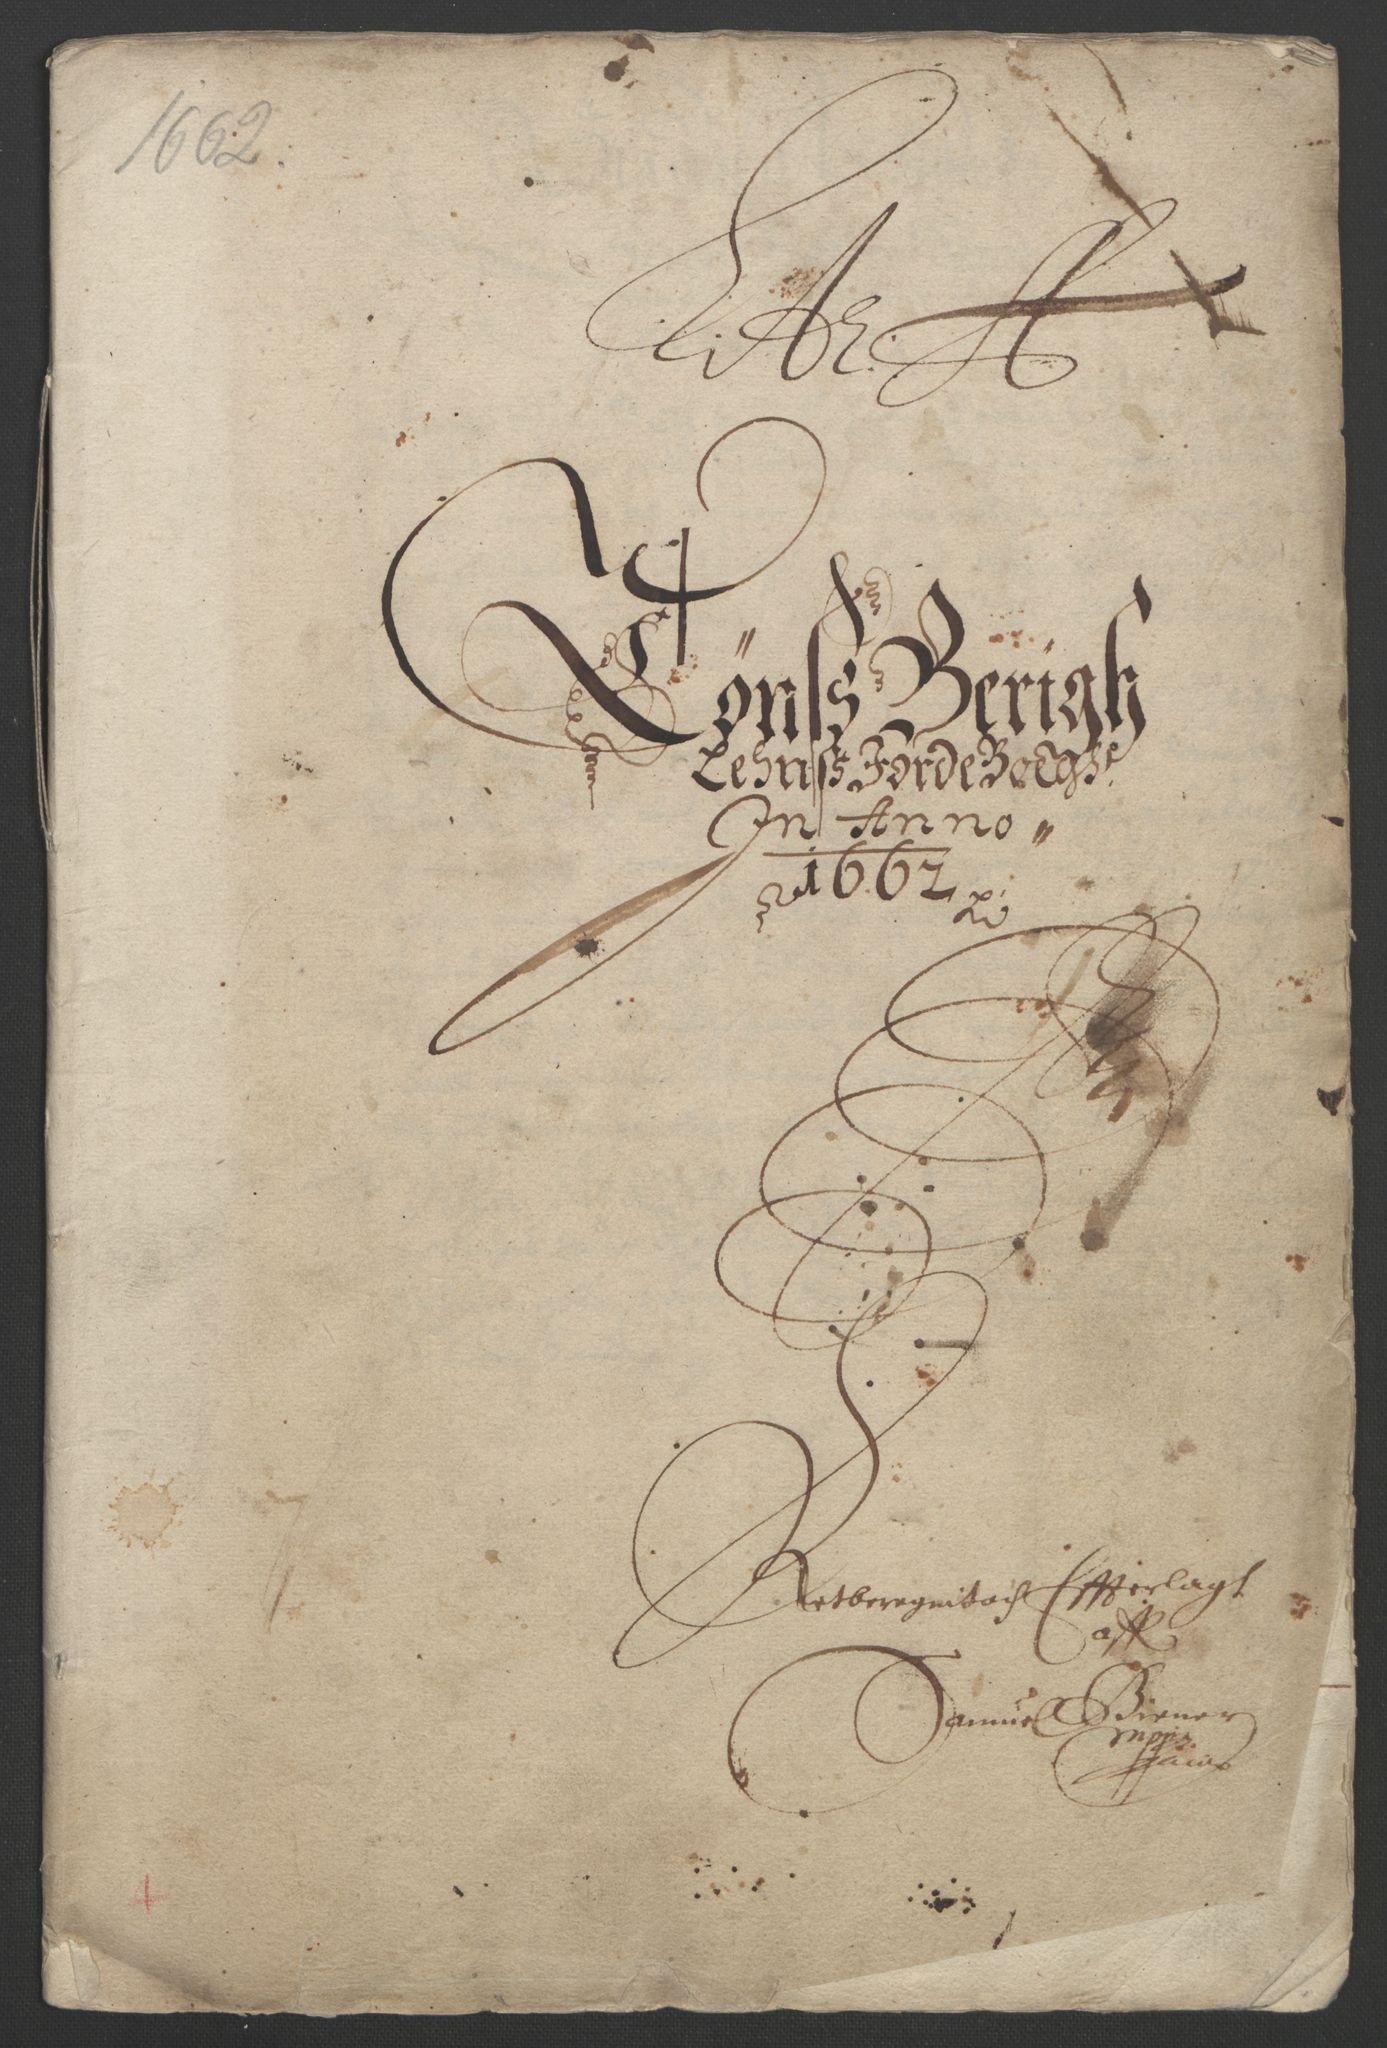 RA, Rentekammeret inntil 1814, Reviderte regnskaper, Fogderegnskap, R32/L1838: Fogderegnskap Jarlsberg grevskap, 1661-1663, s. 151